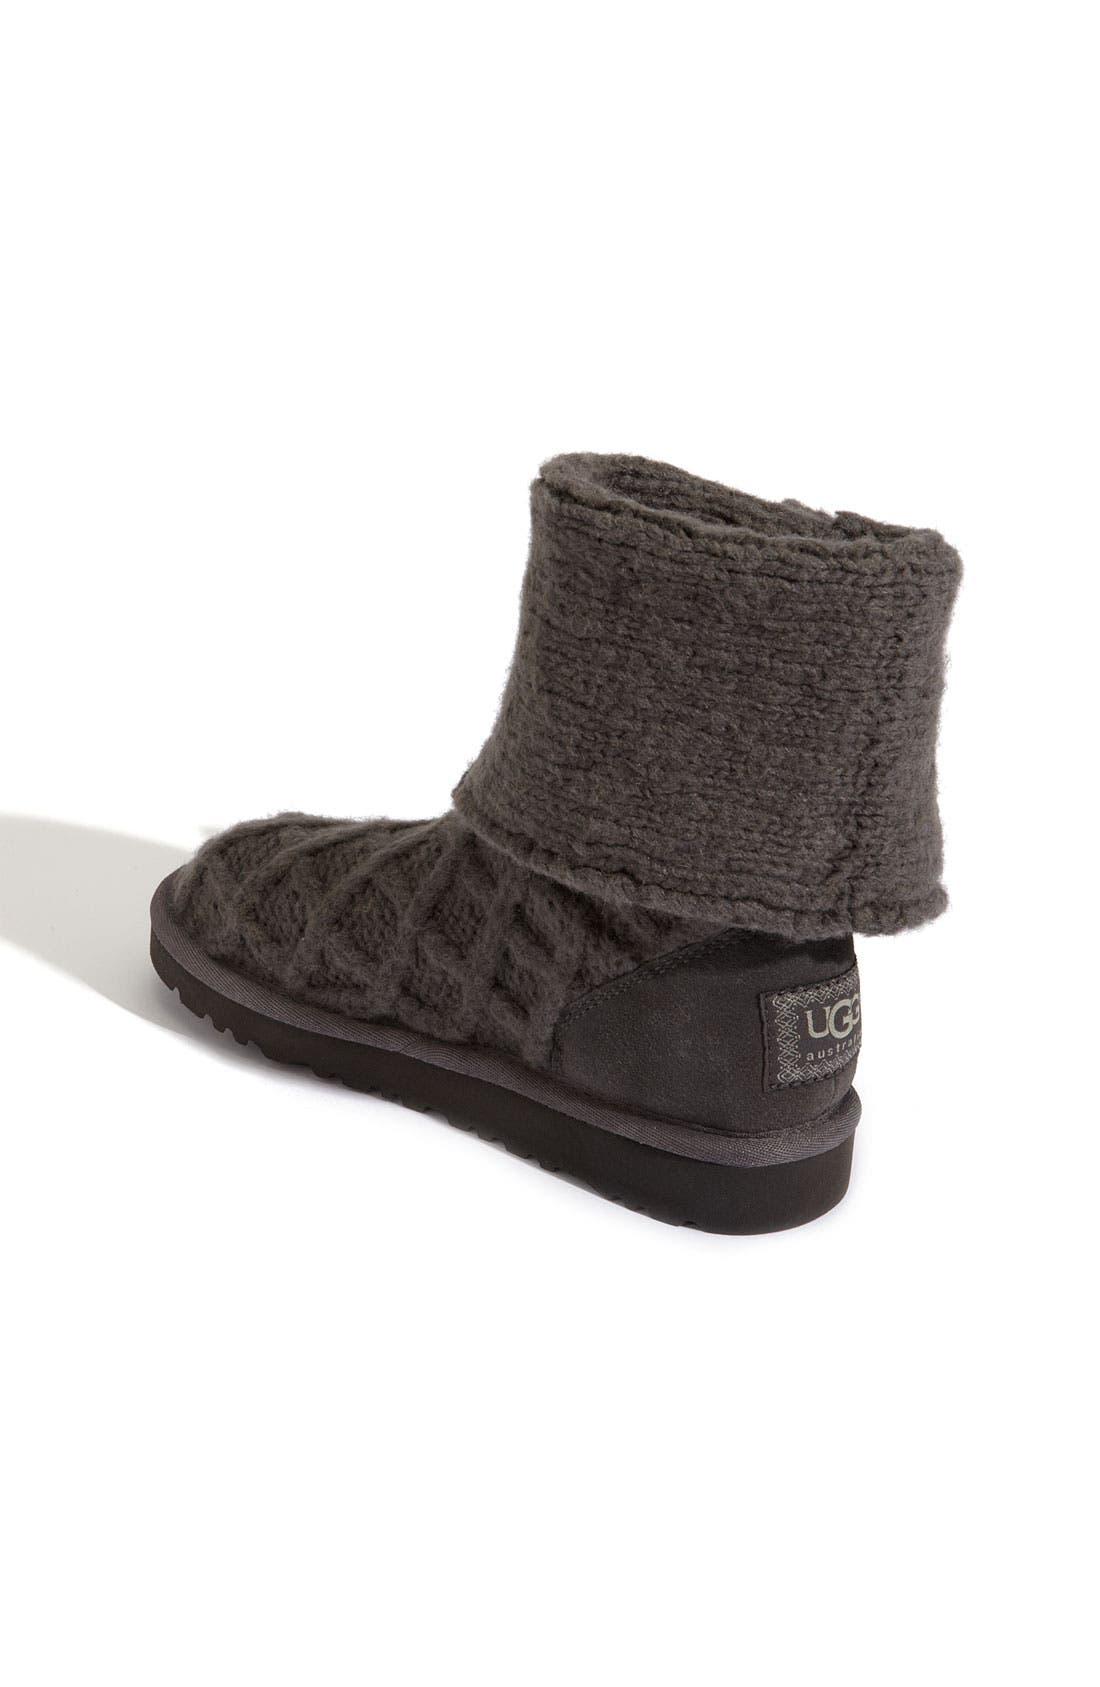 Alternate Image 2  - UGG® Australia 'Lattice Cardy' Boot (Toddler, Little Kid & Big Kid)